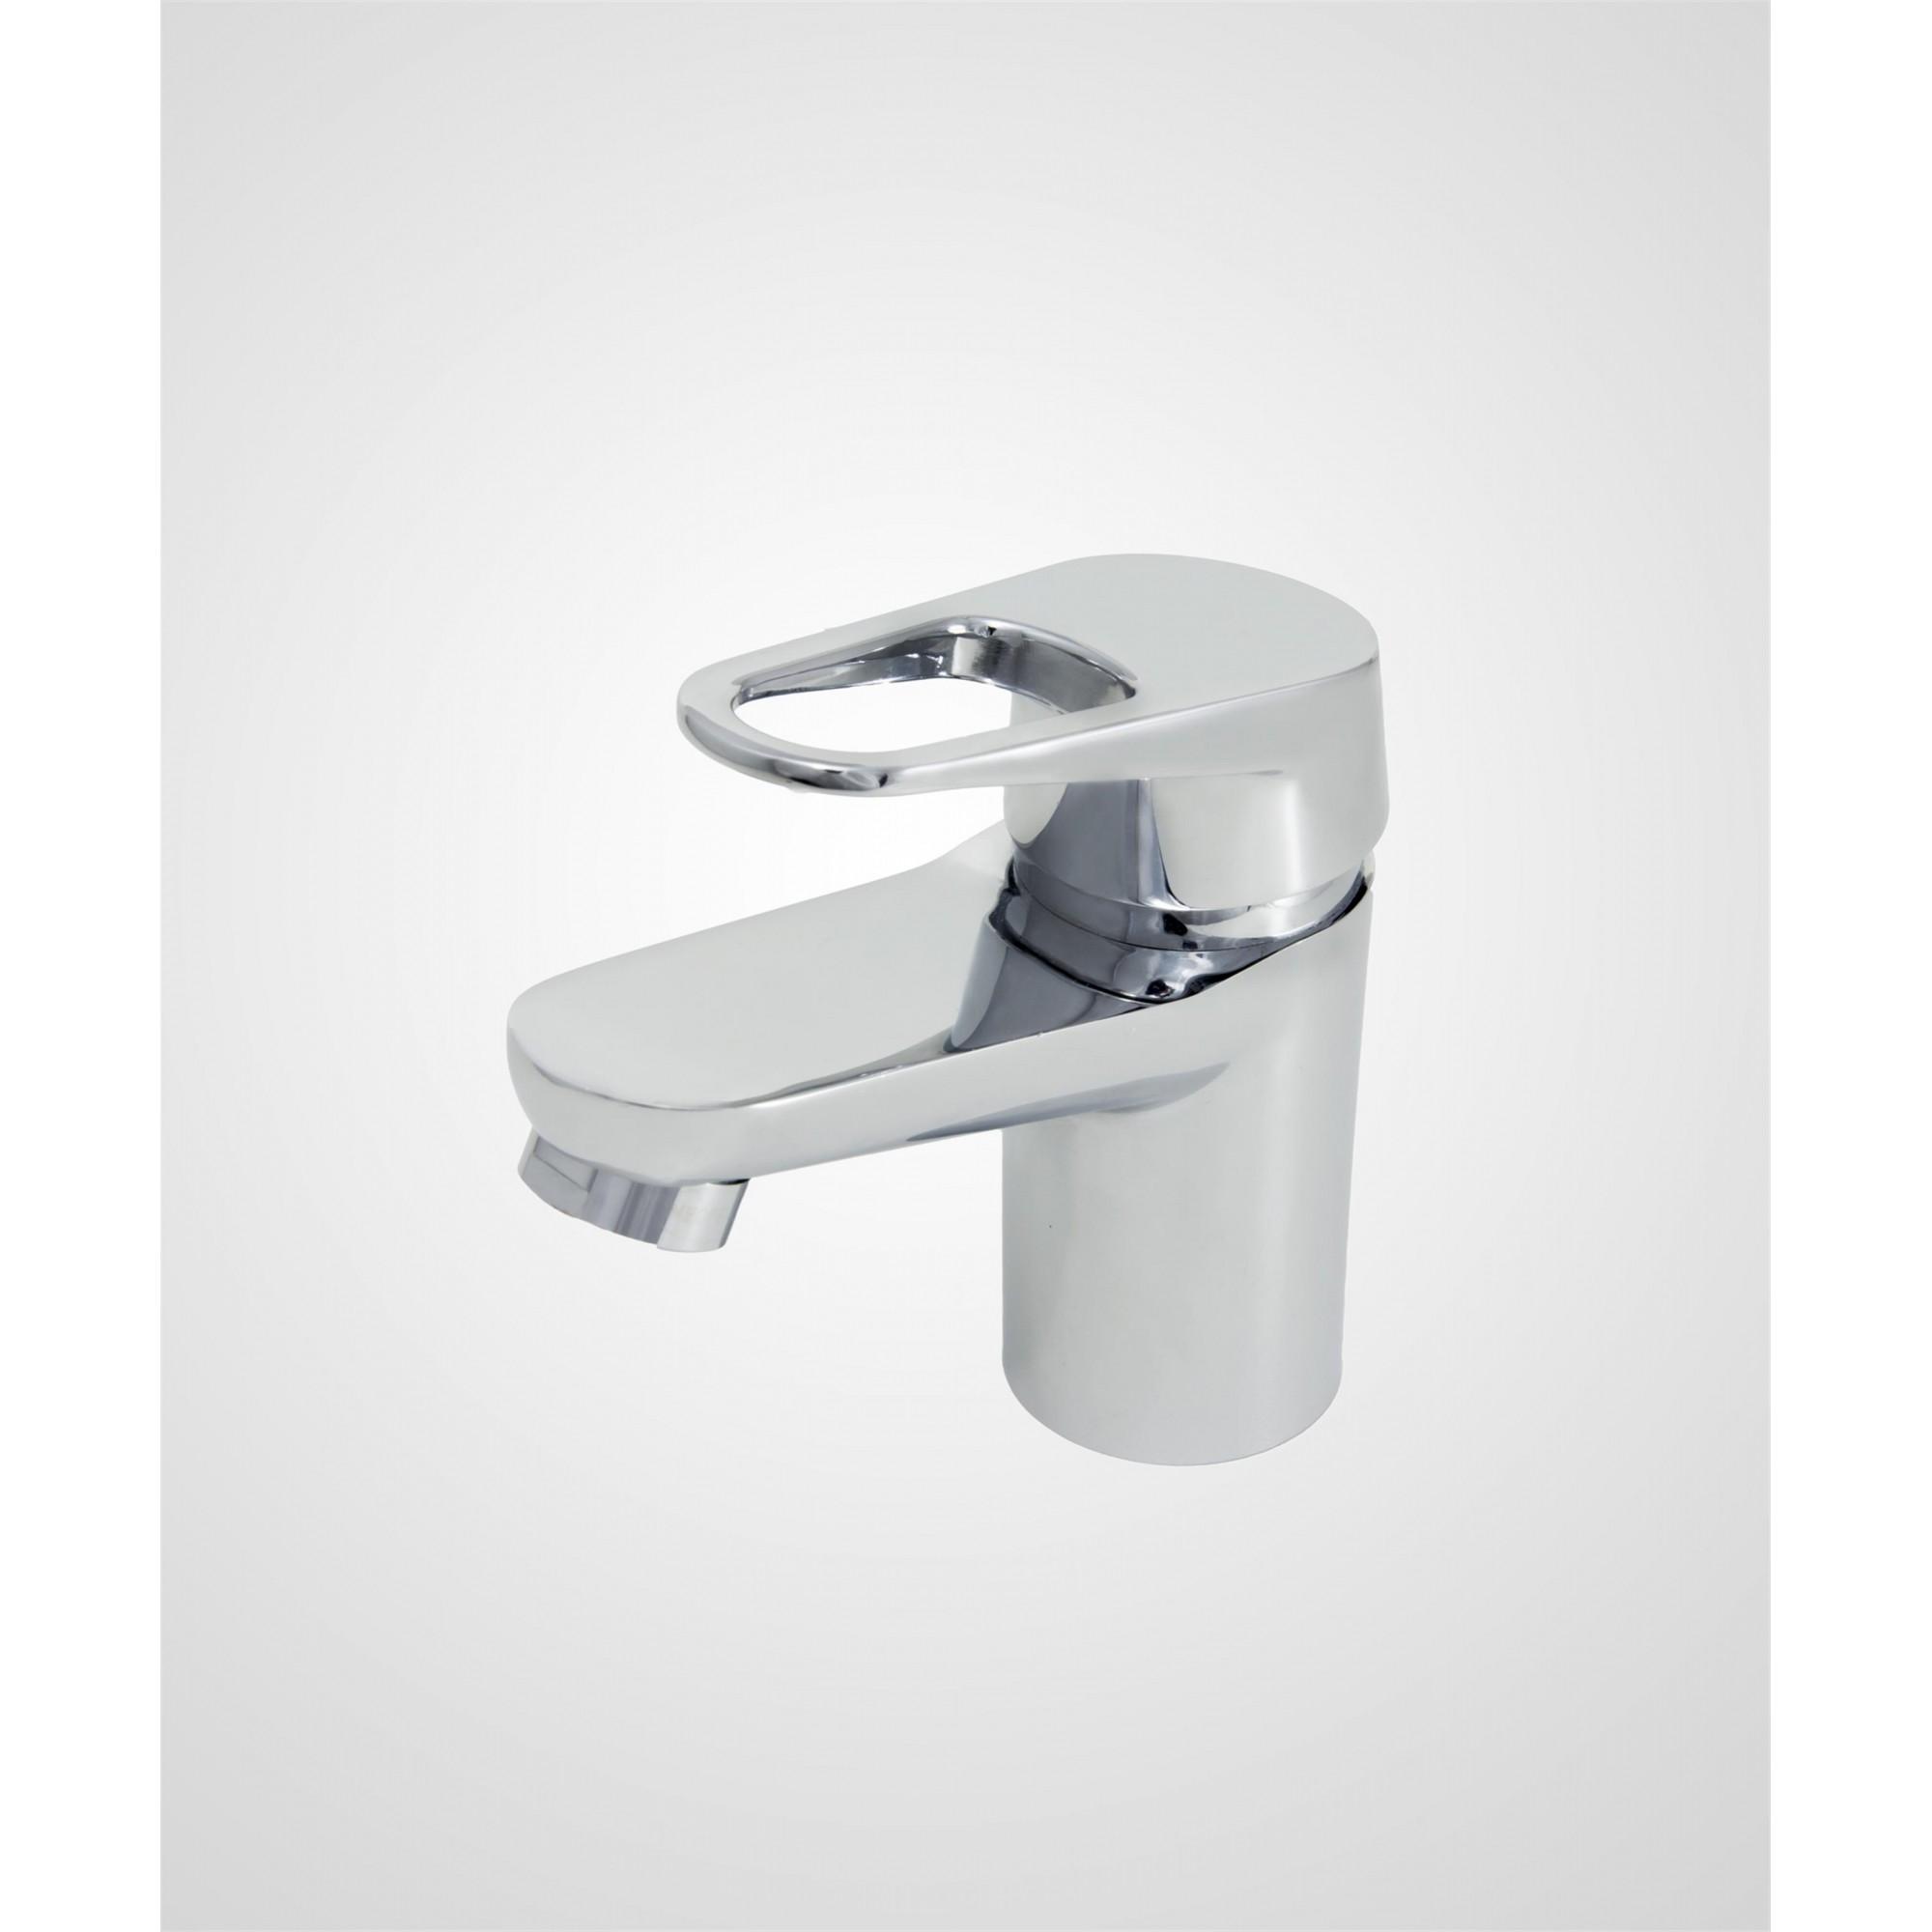 Misturador Monocomando Lavatório De Mesa Gap 2875.C75 Perflex